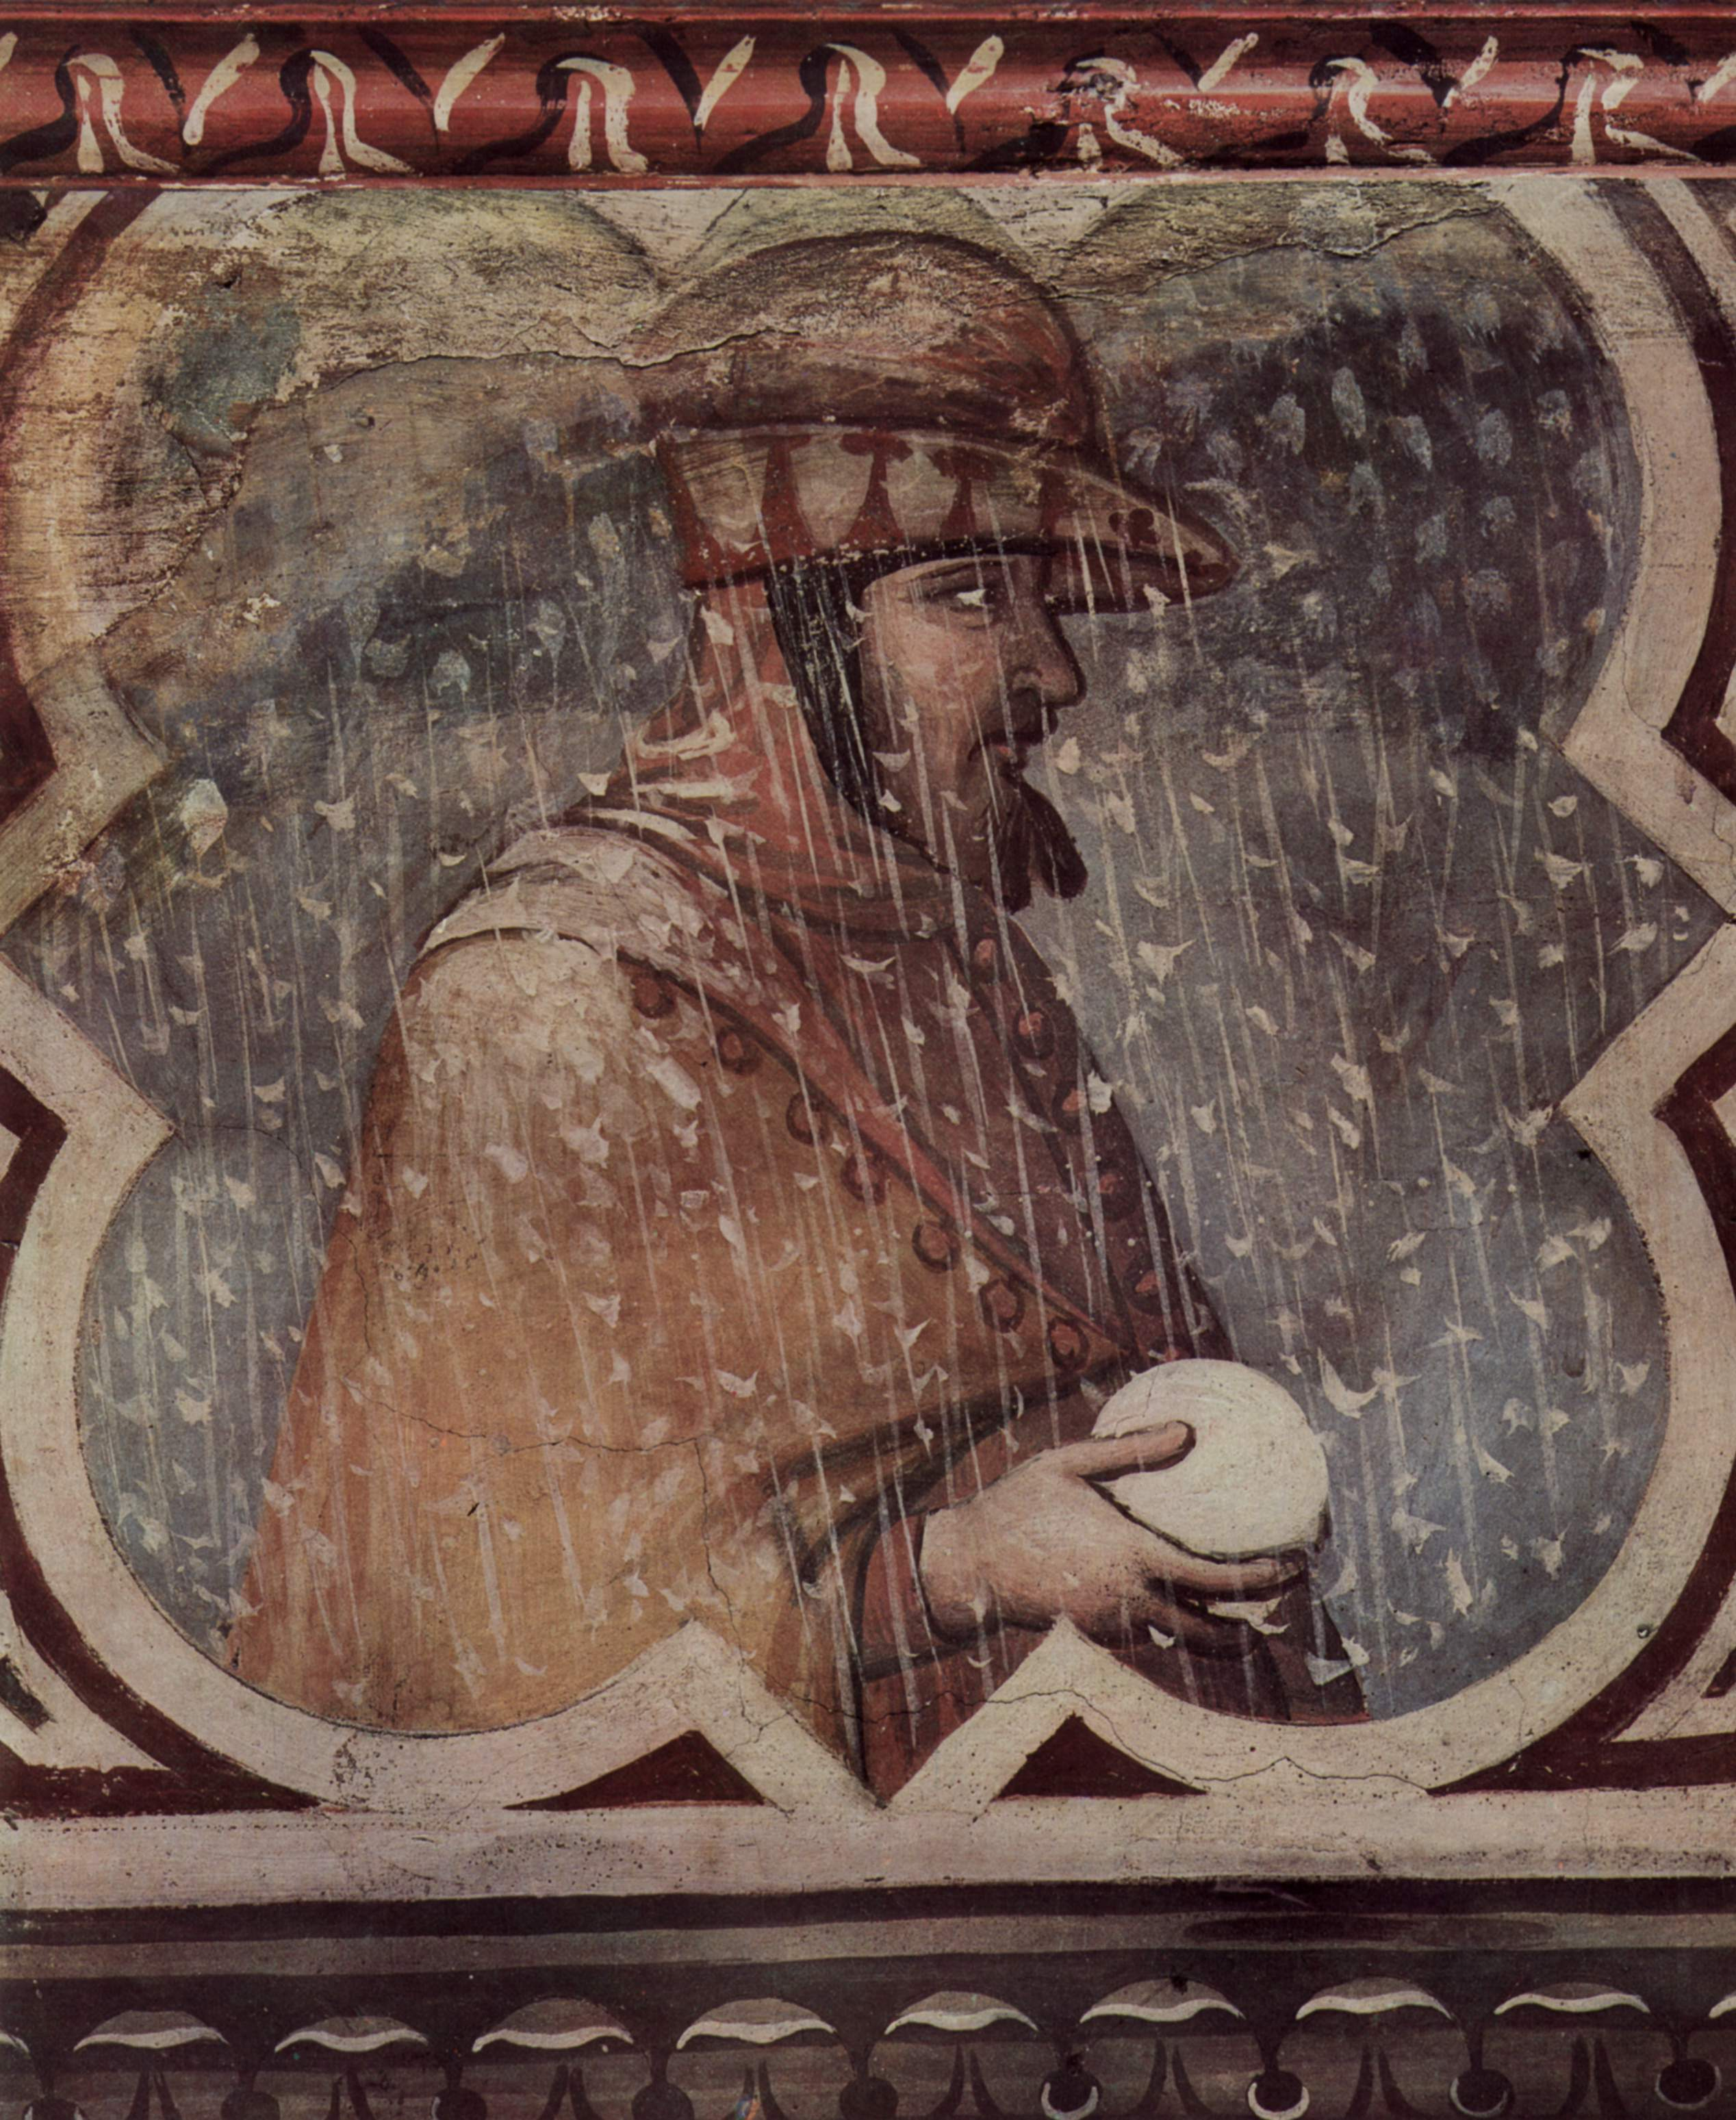 Ambrogio_Lorenzetti_010.jpg